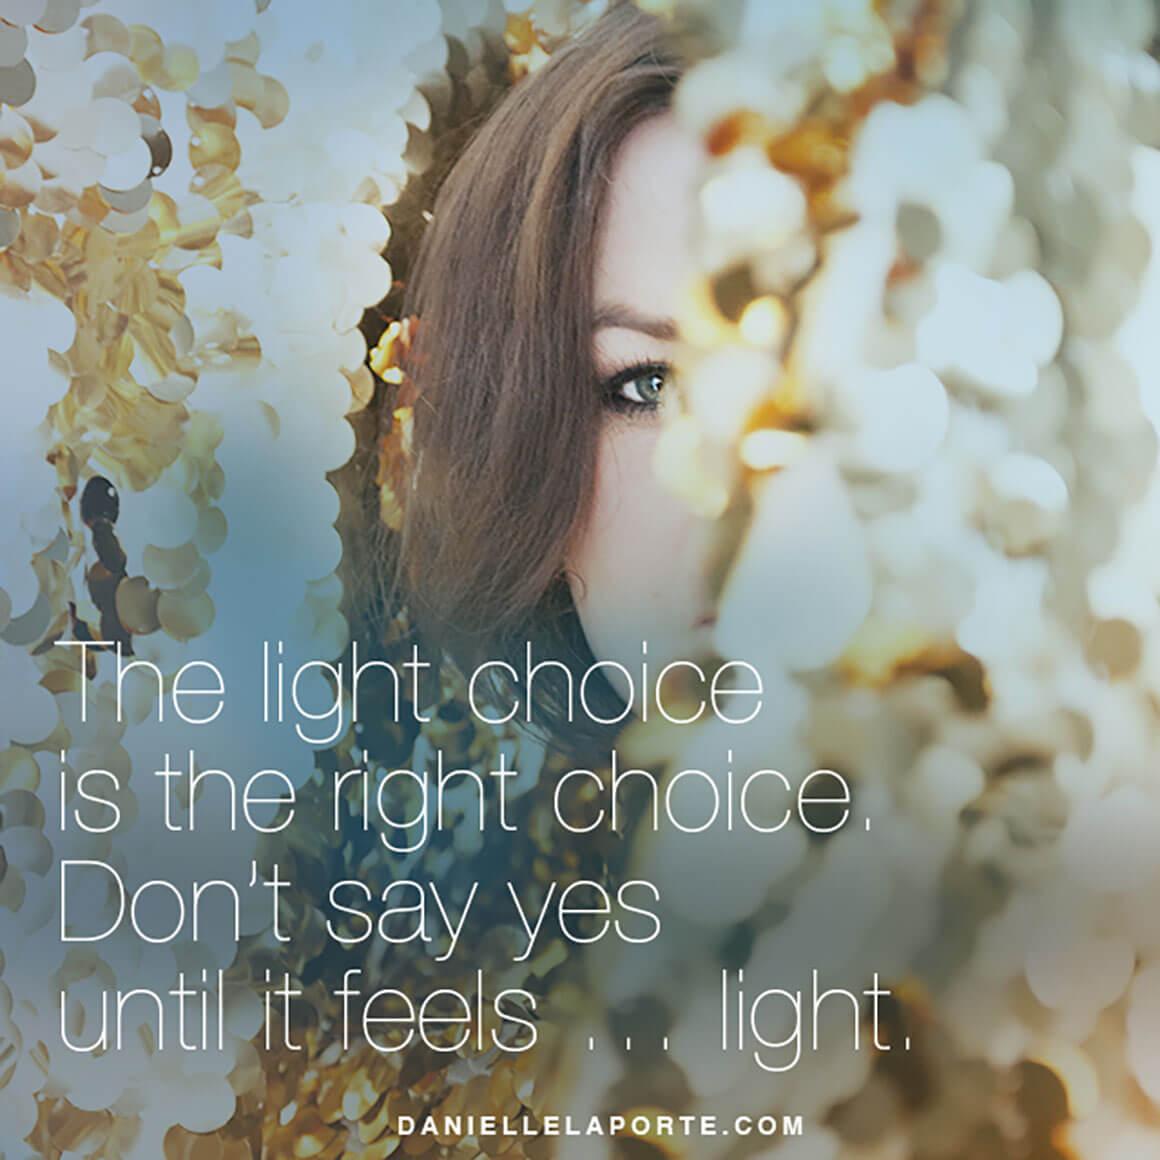 Danielle-LaPorte-Light-Choice.jpg